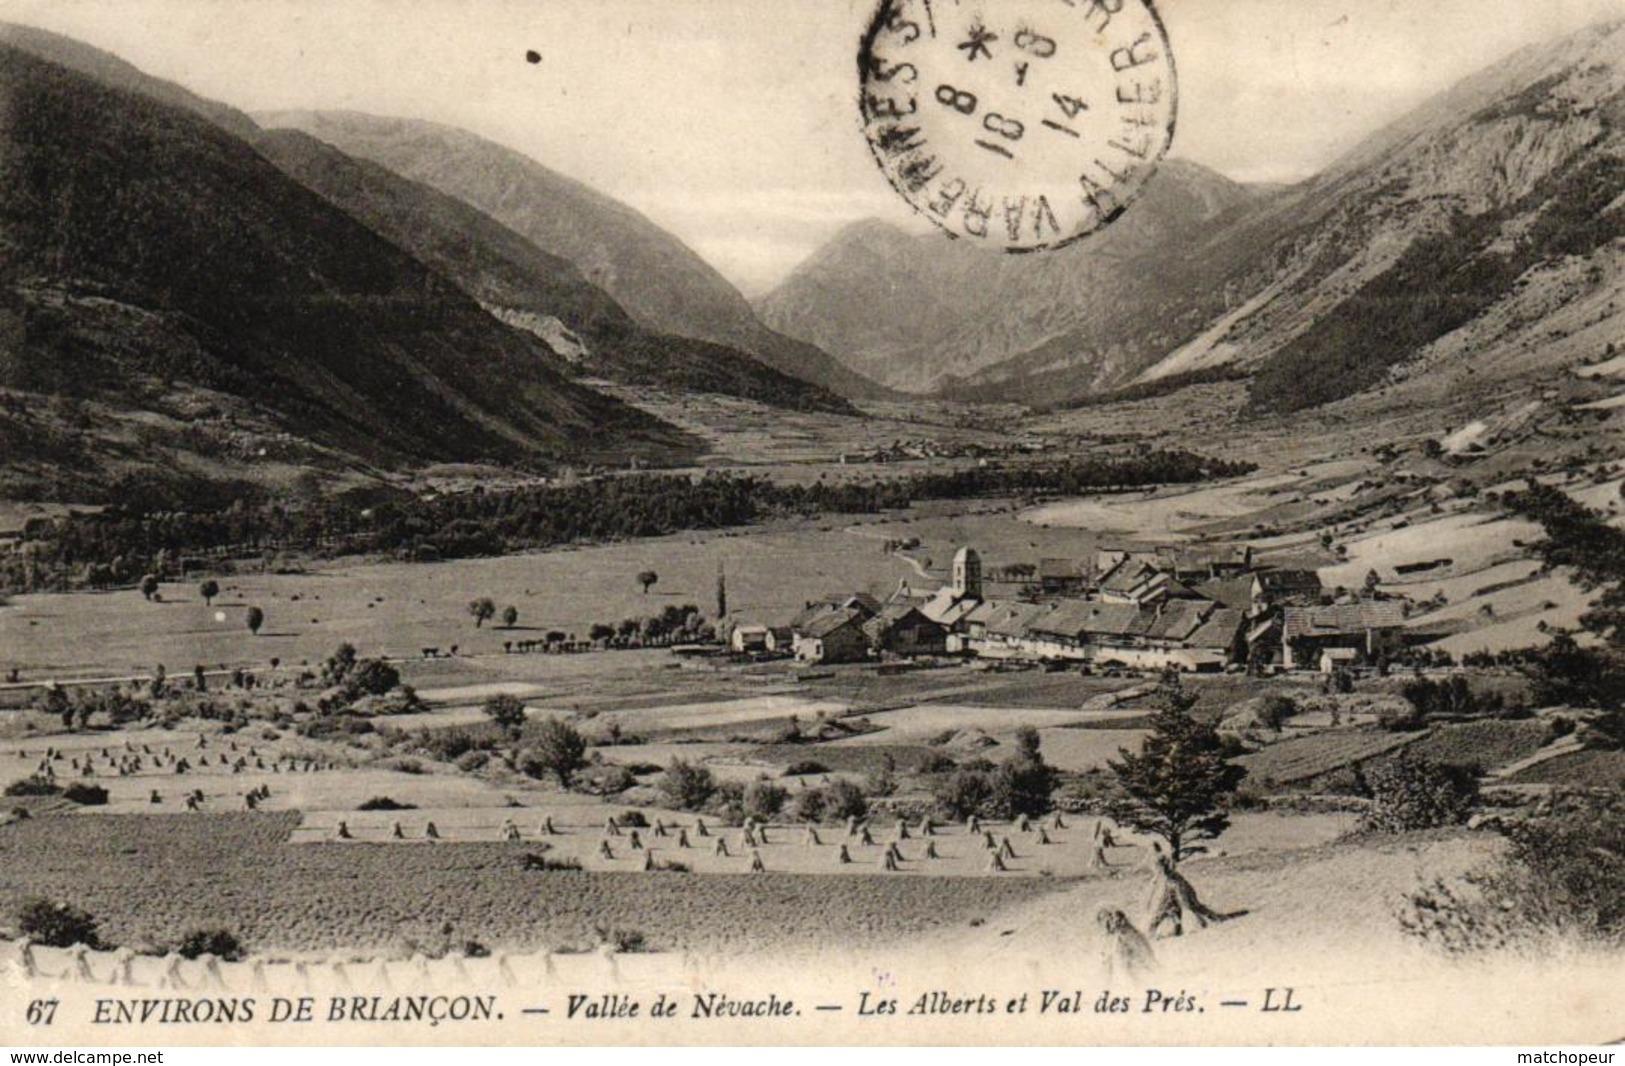 ENVIRONS DE BRIANCON -05- VALLEE DE NEVACHE LES ALBERTS ET VAL DES PRES - Briancon